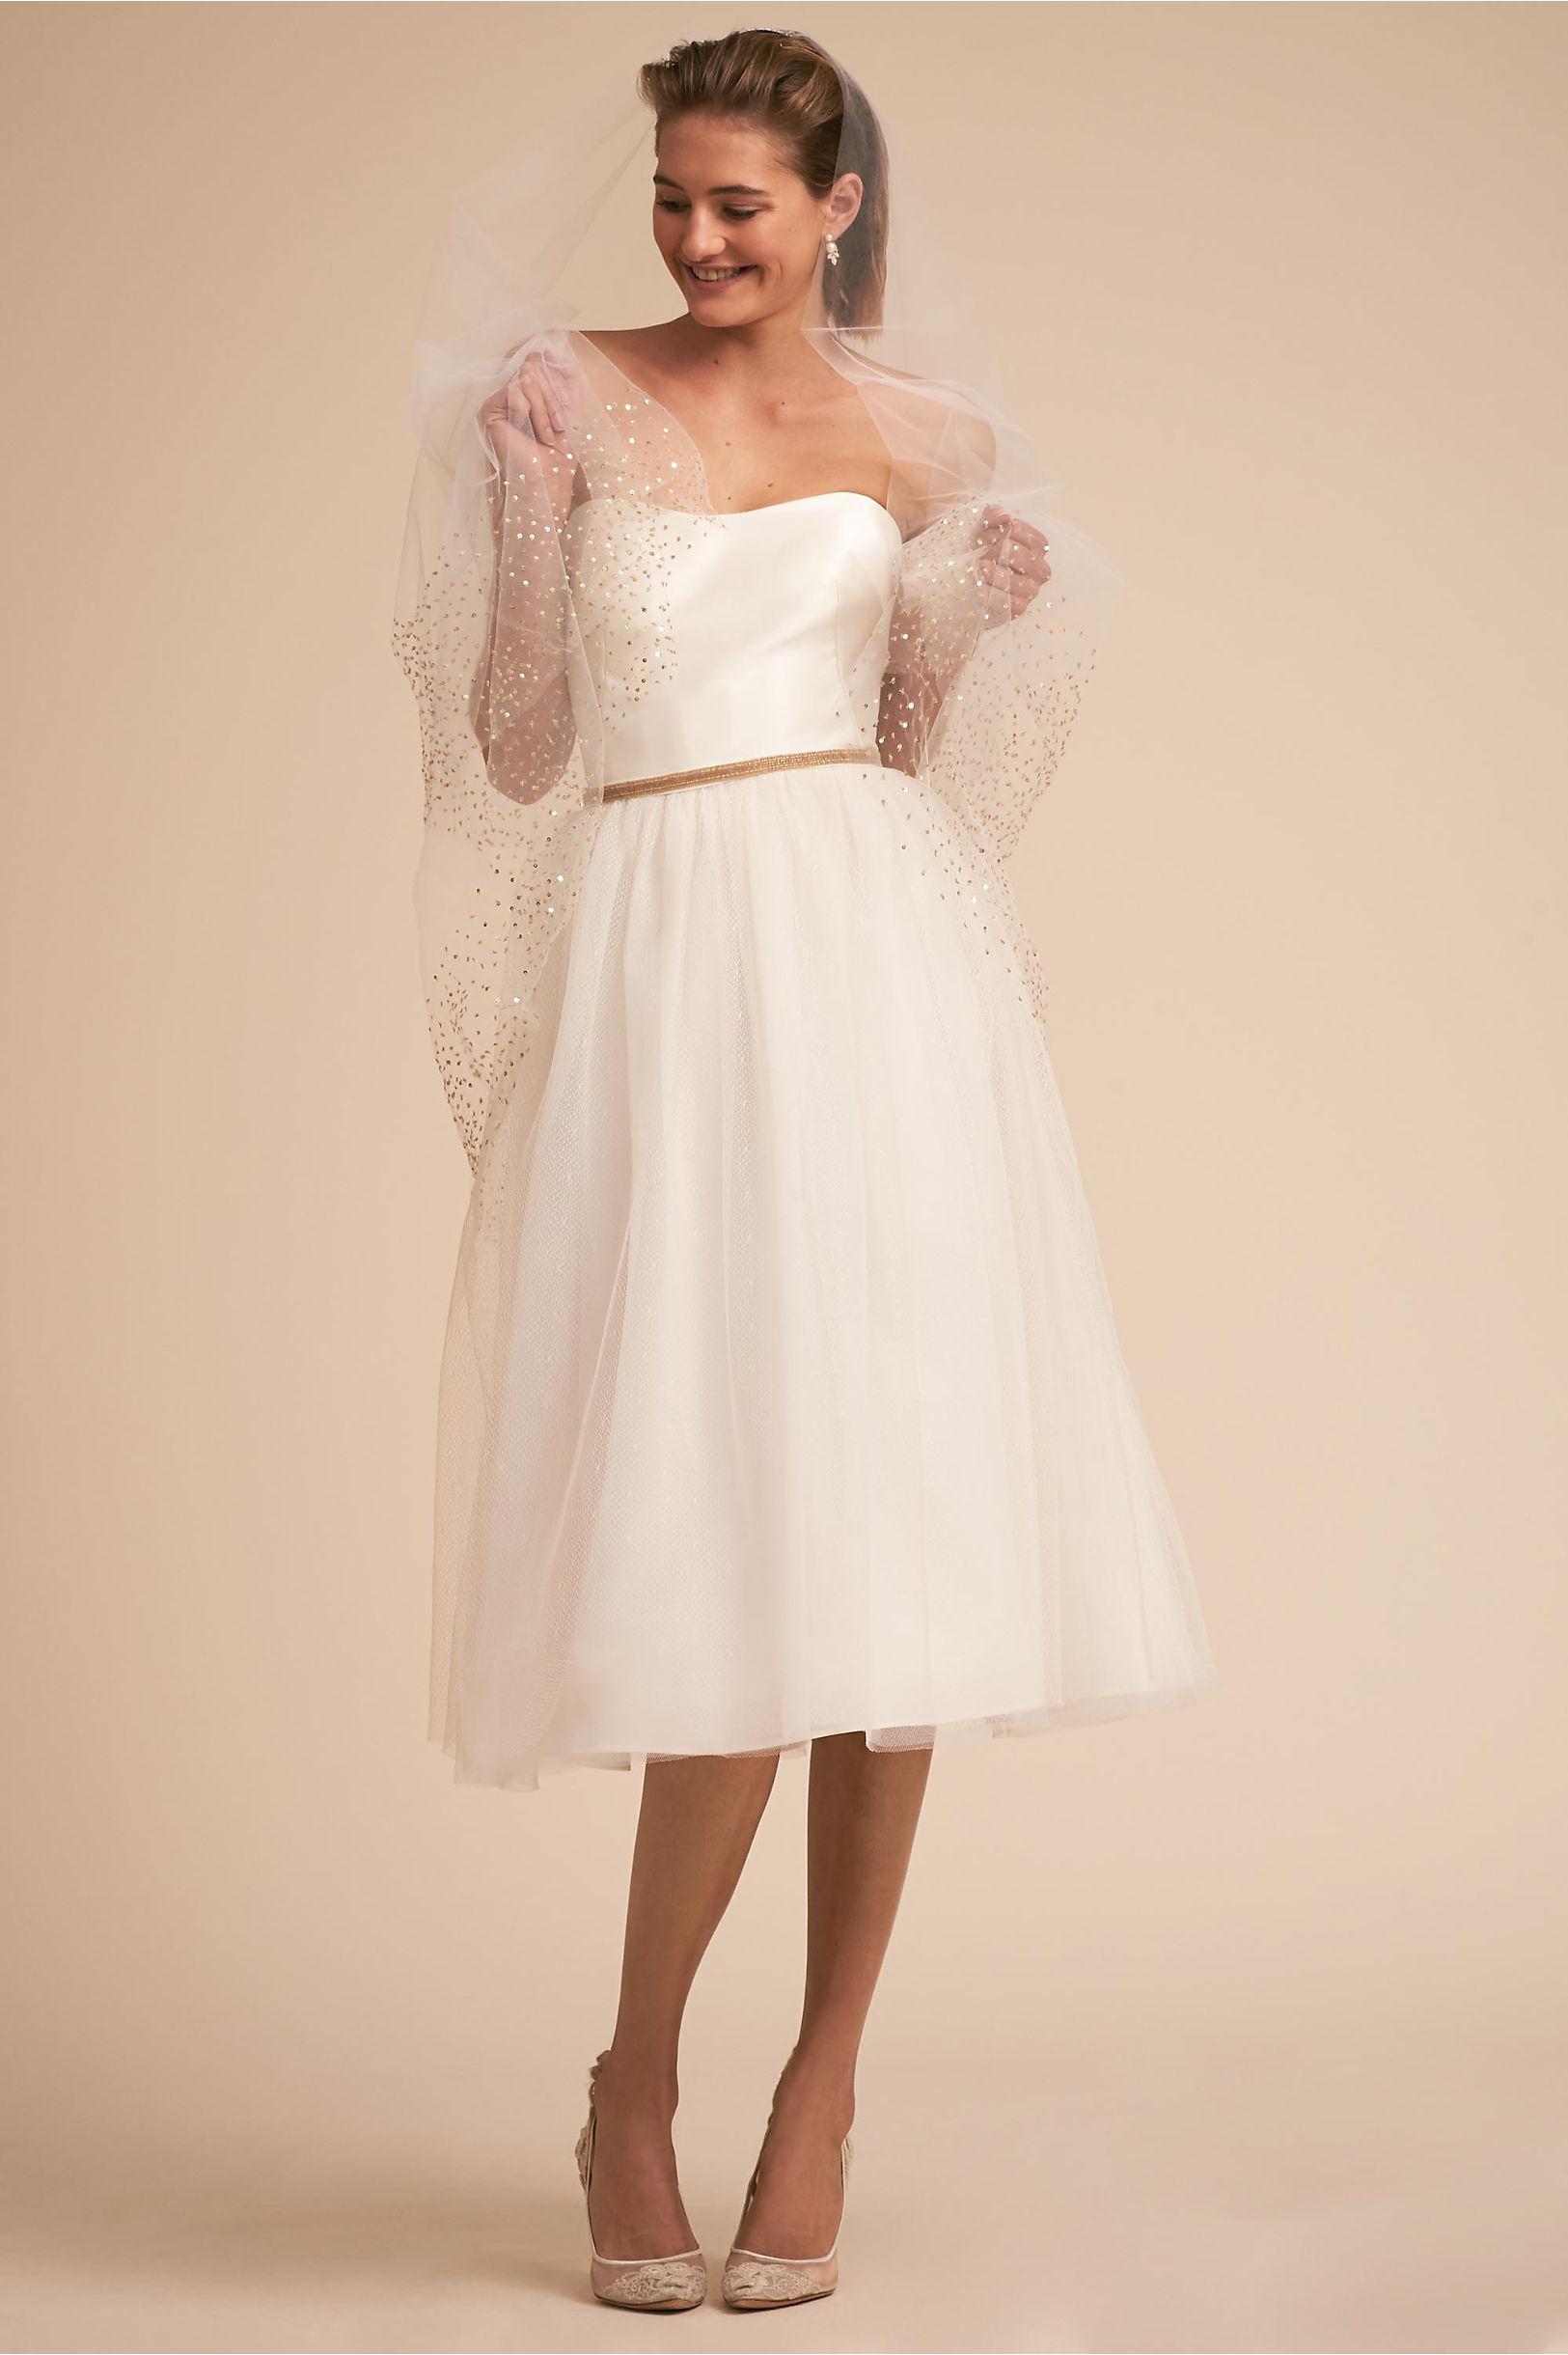 Hamilton Gown Ivory in Sale | BHLDN